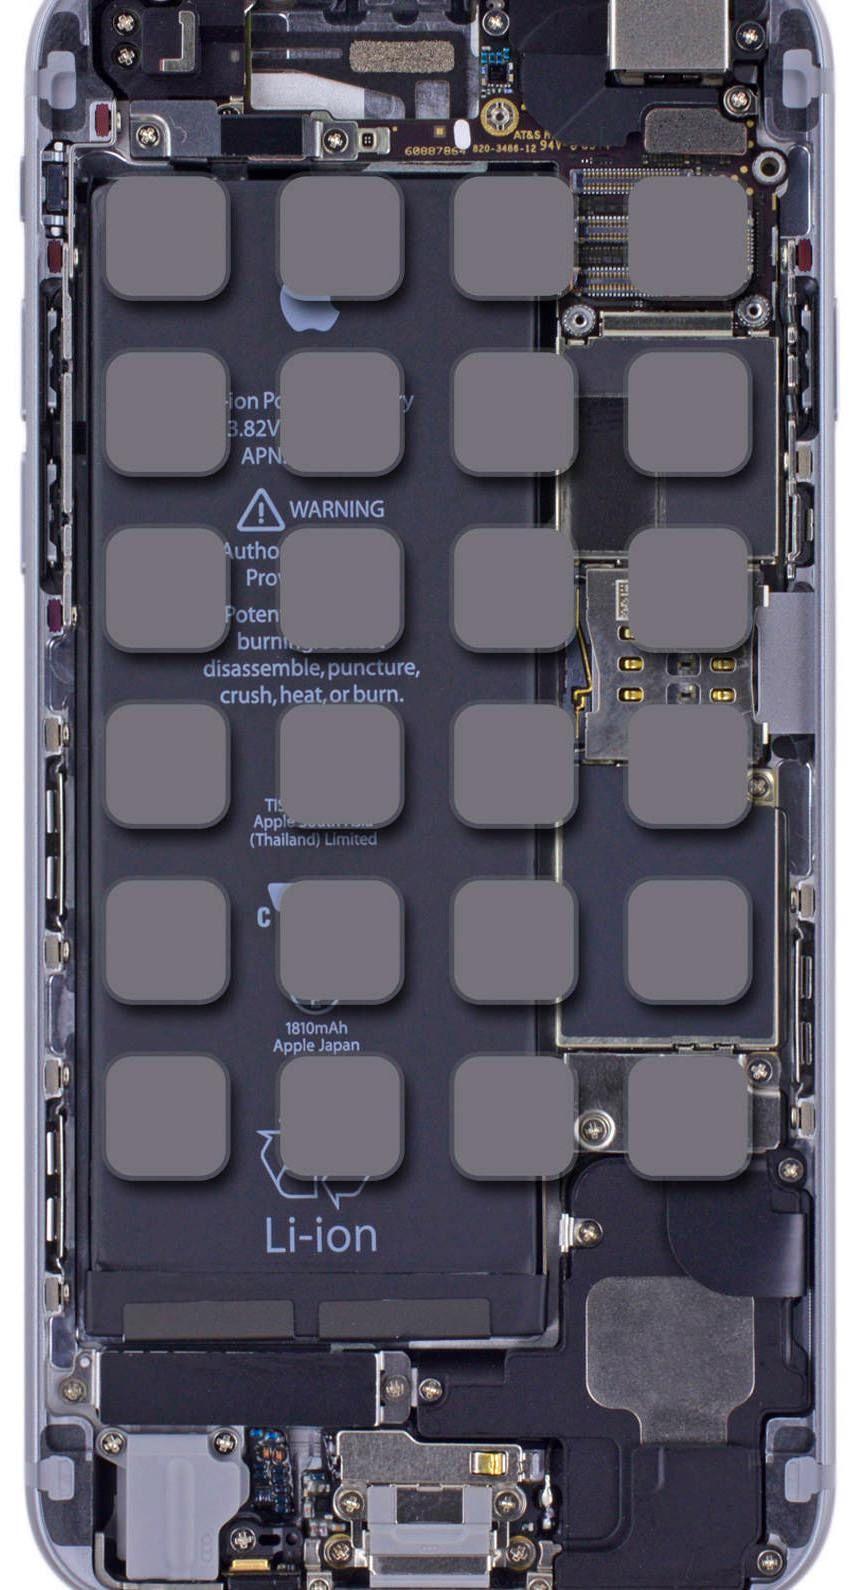 Iphone 6 Wallpaper Wallpapers Iphone Wallpaper Iphone 6